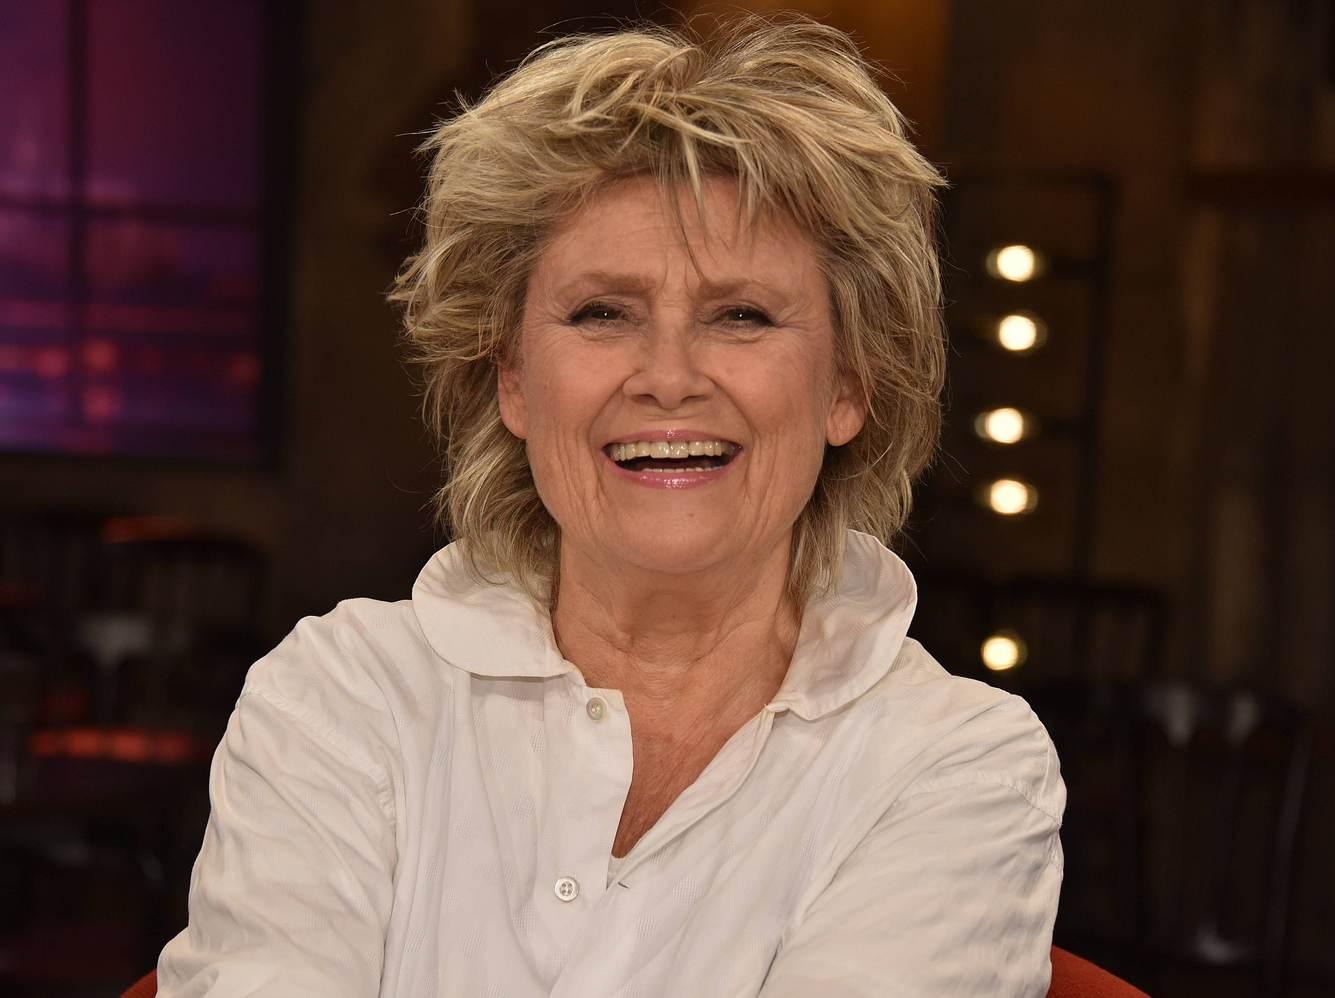 Sängerin Gitte Hænning lacht in die Kamera.